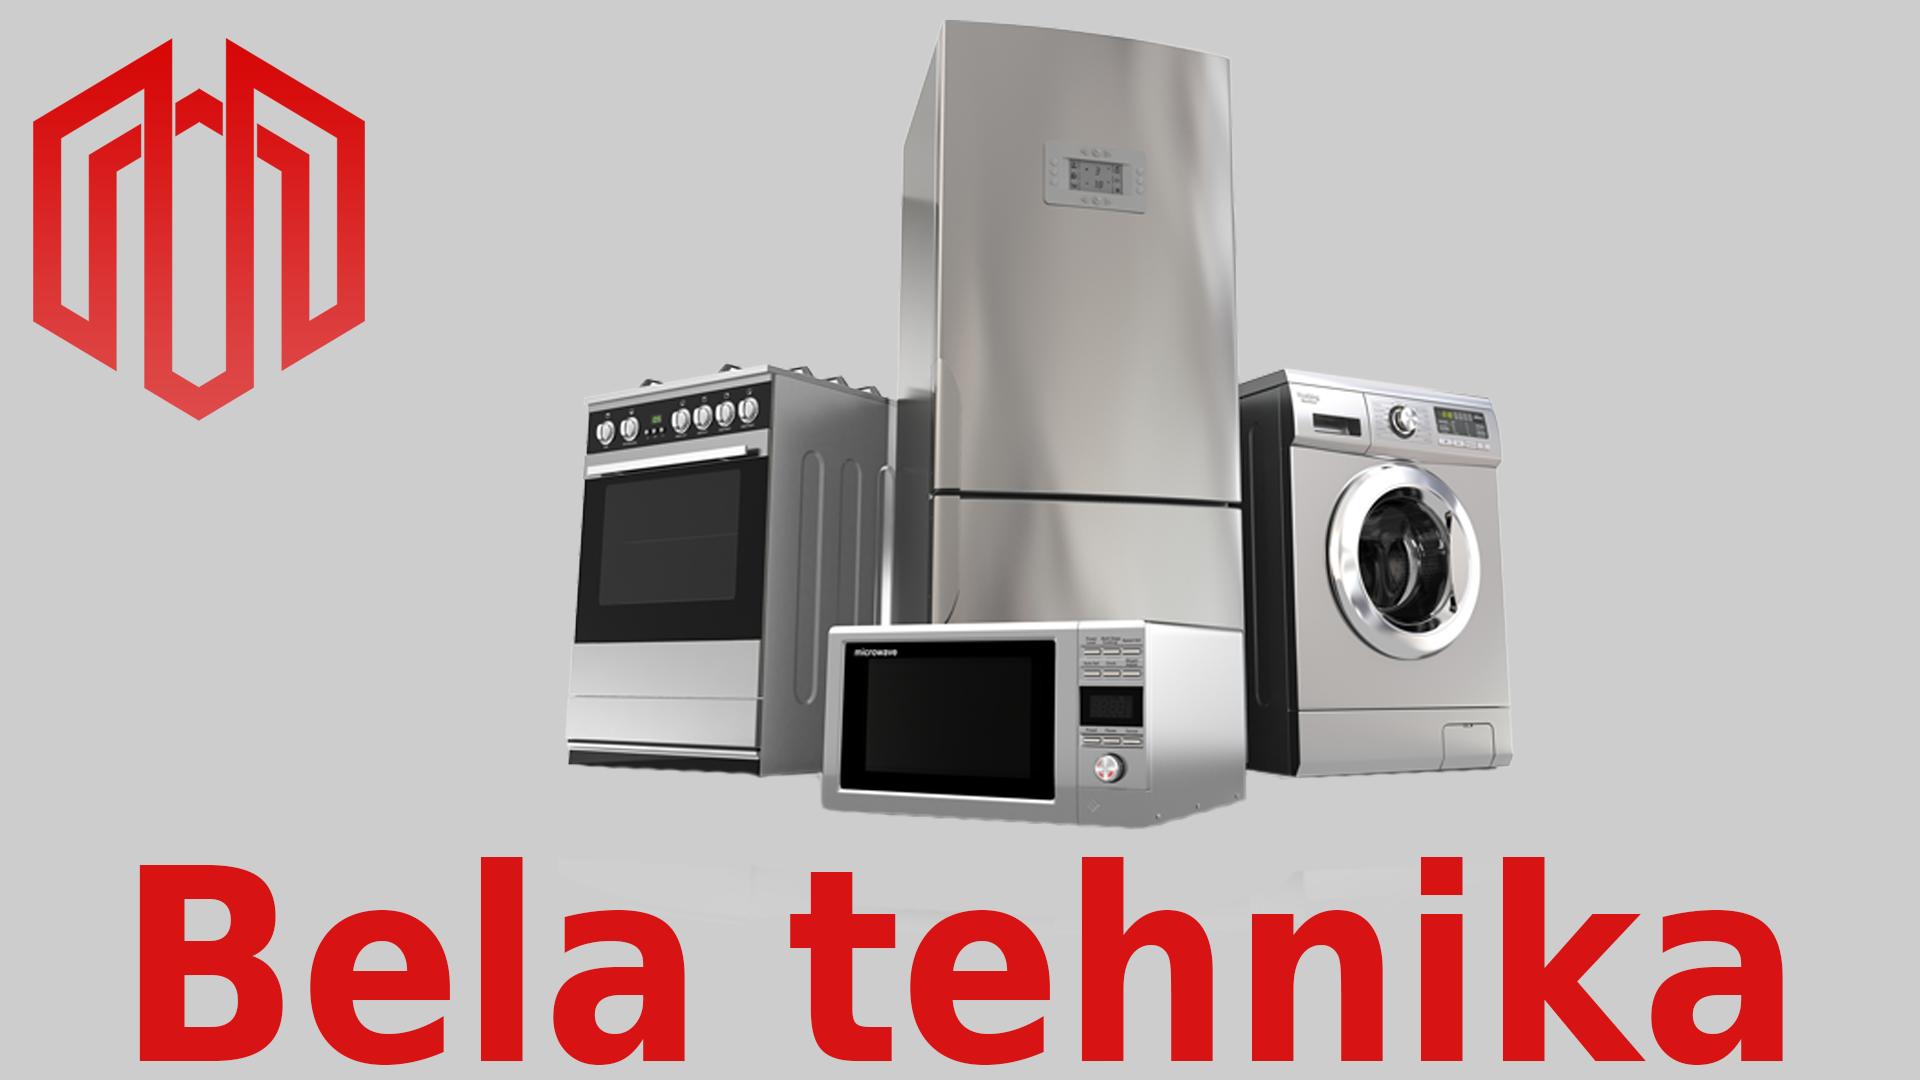 bela_tehnika_megatron_shop_home_centar_vera